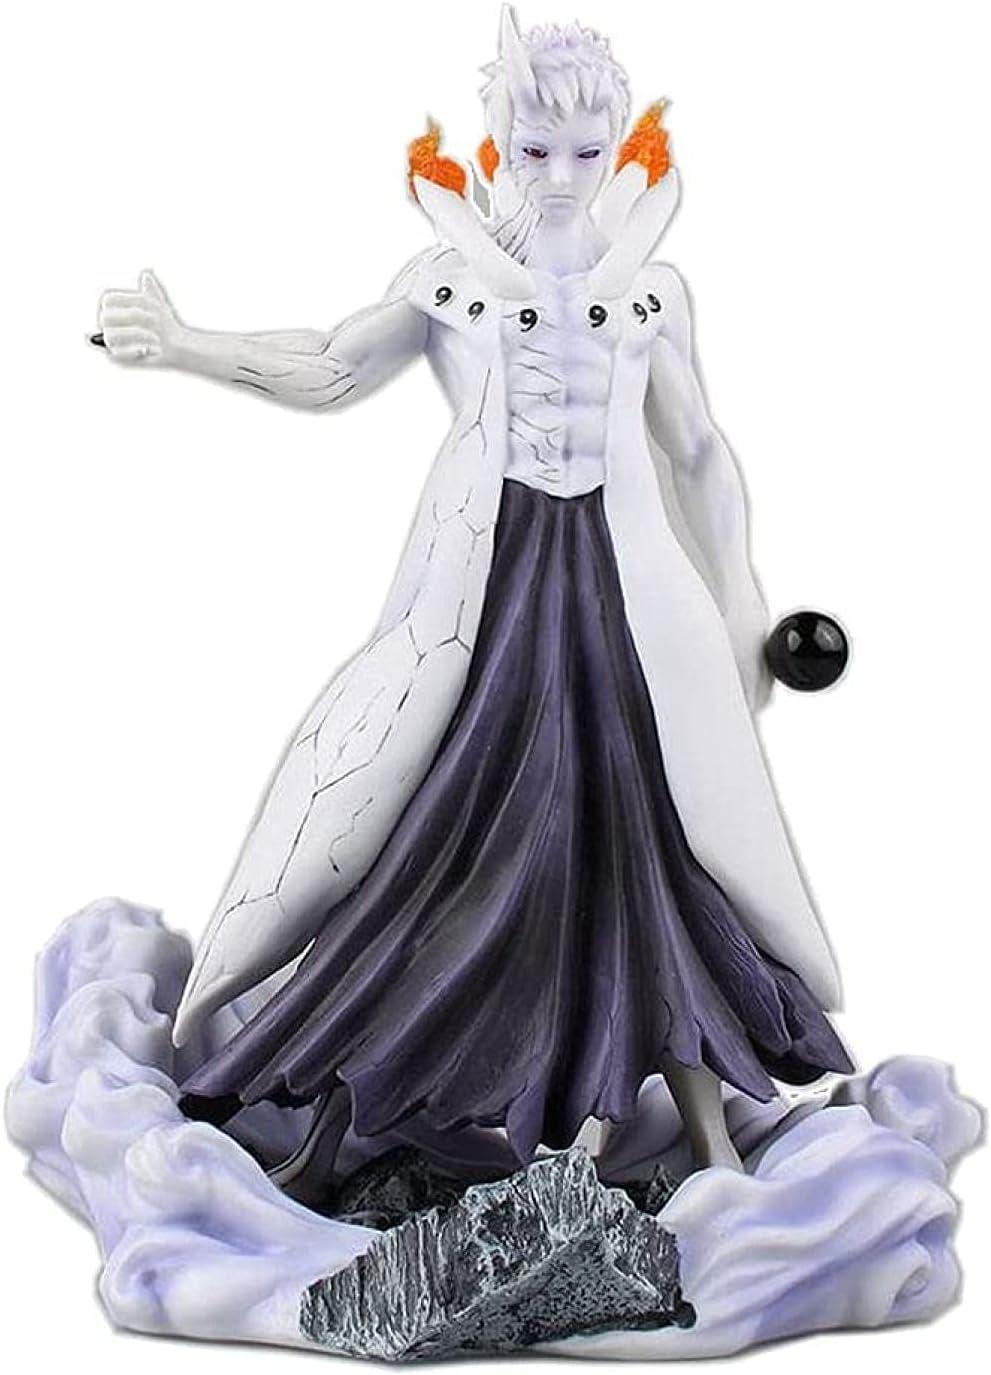 Naruto Safety and trust six Floor Belt Uchiha New arrival Decorat Interchangeable Head Statue